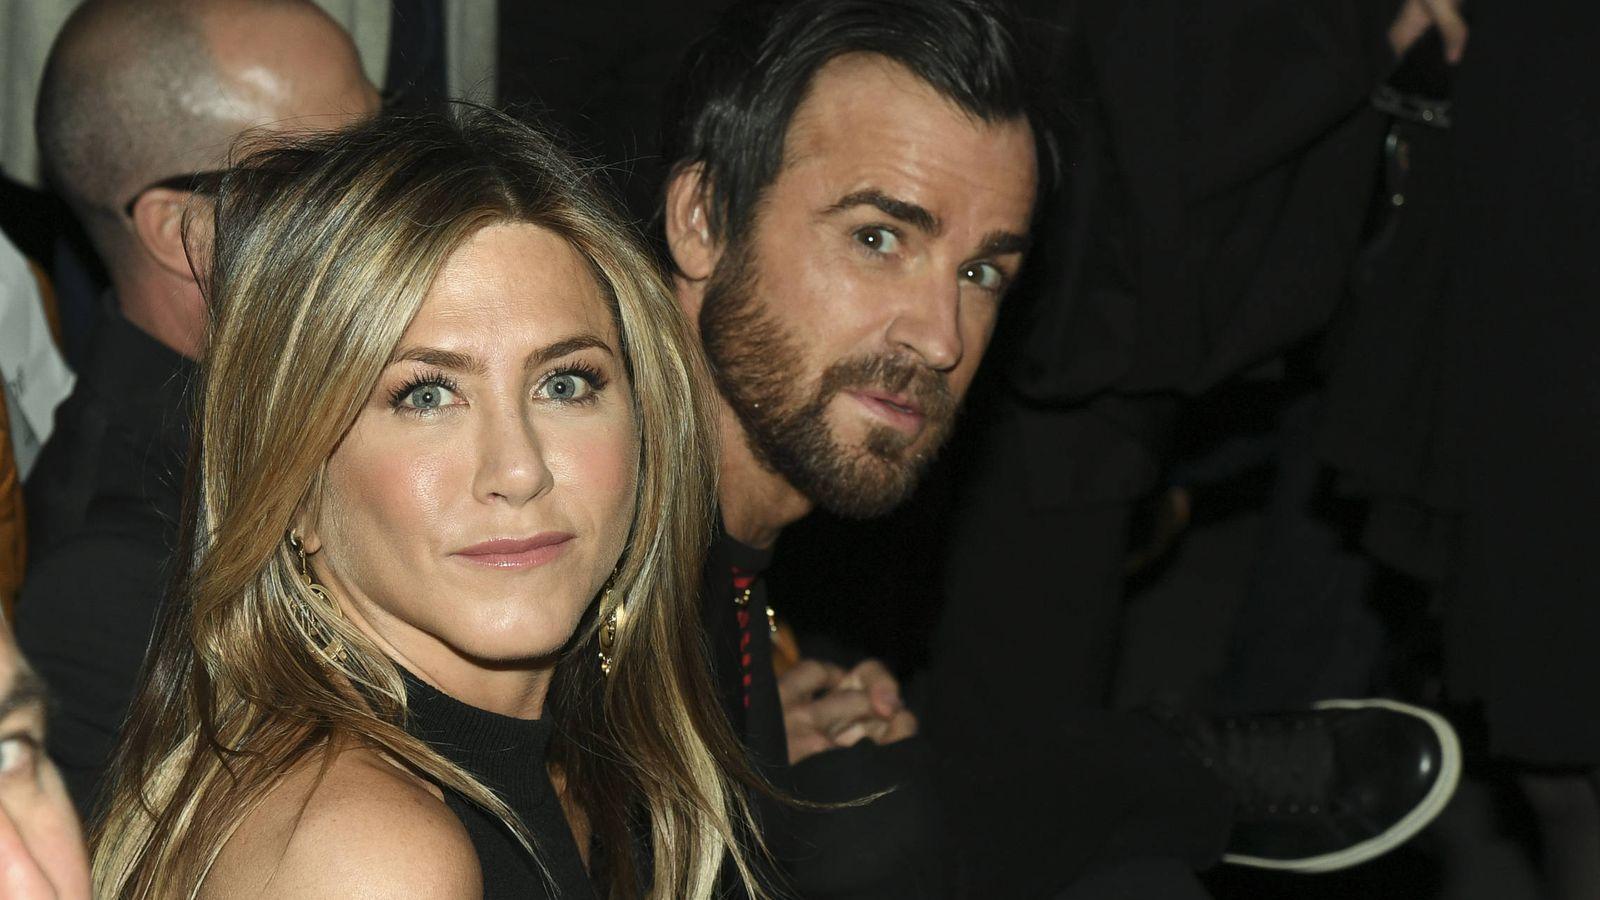 Foto: Jennifer Aniston y Justin Theroux en una imagen de archivo. (Gtres)